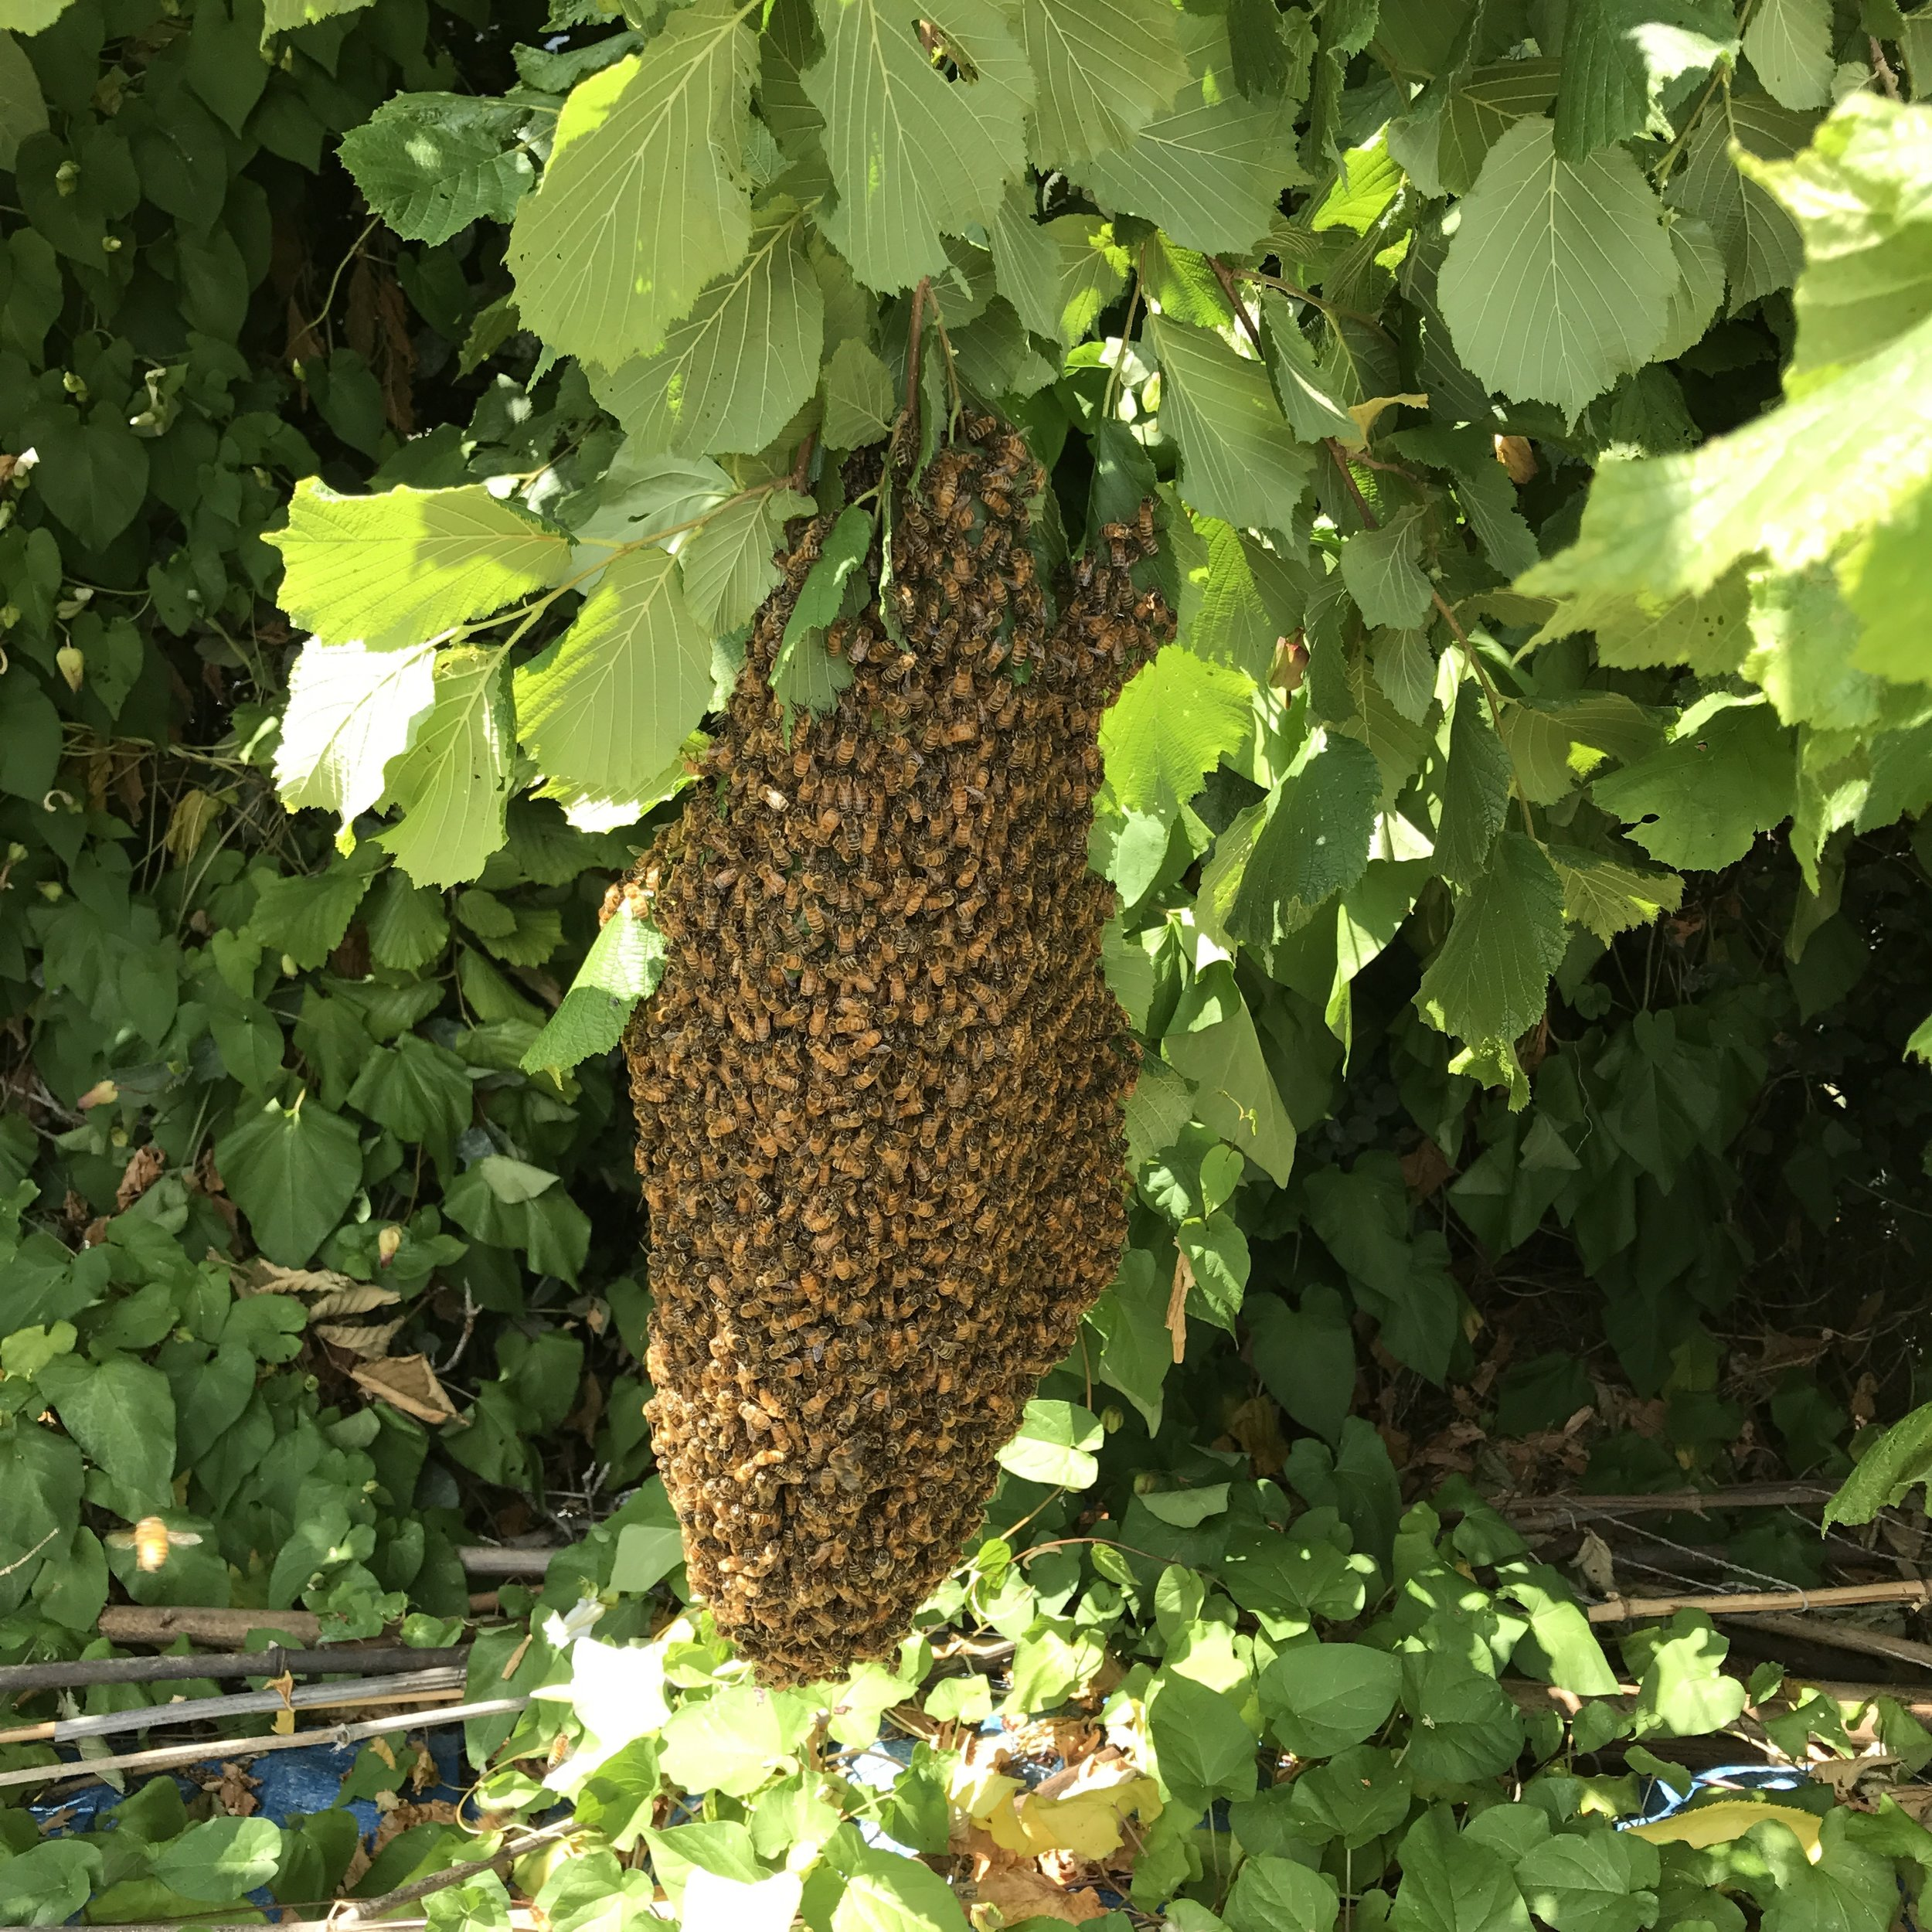 save the swarm!